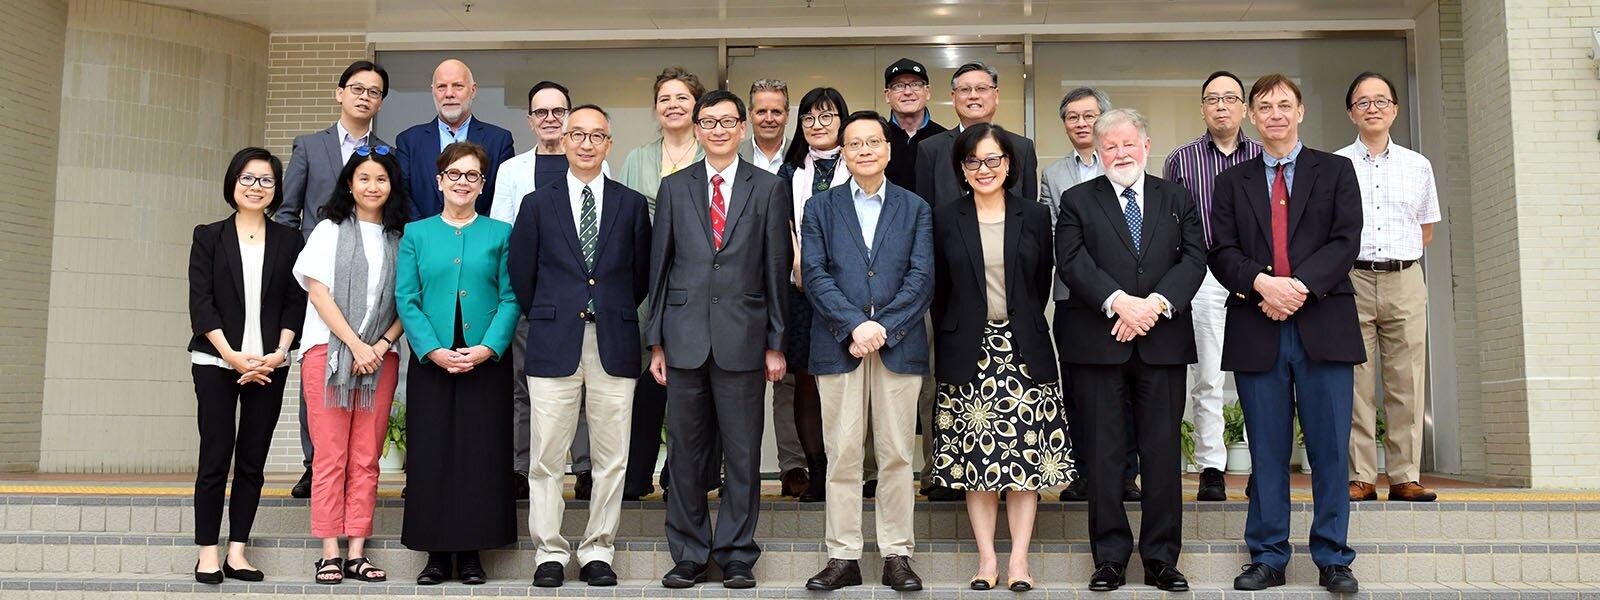 Renewal of EdUHK's UNESCO Chair